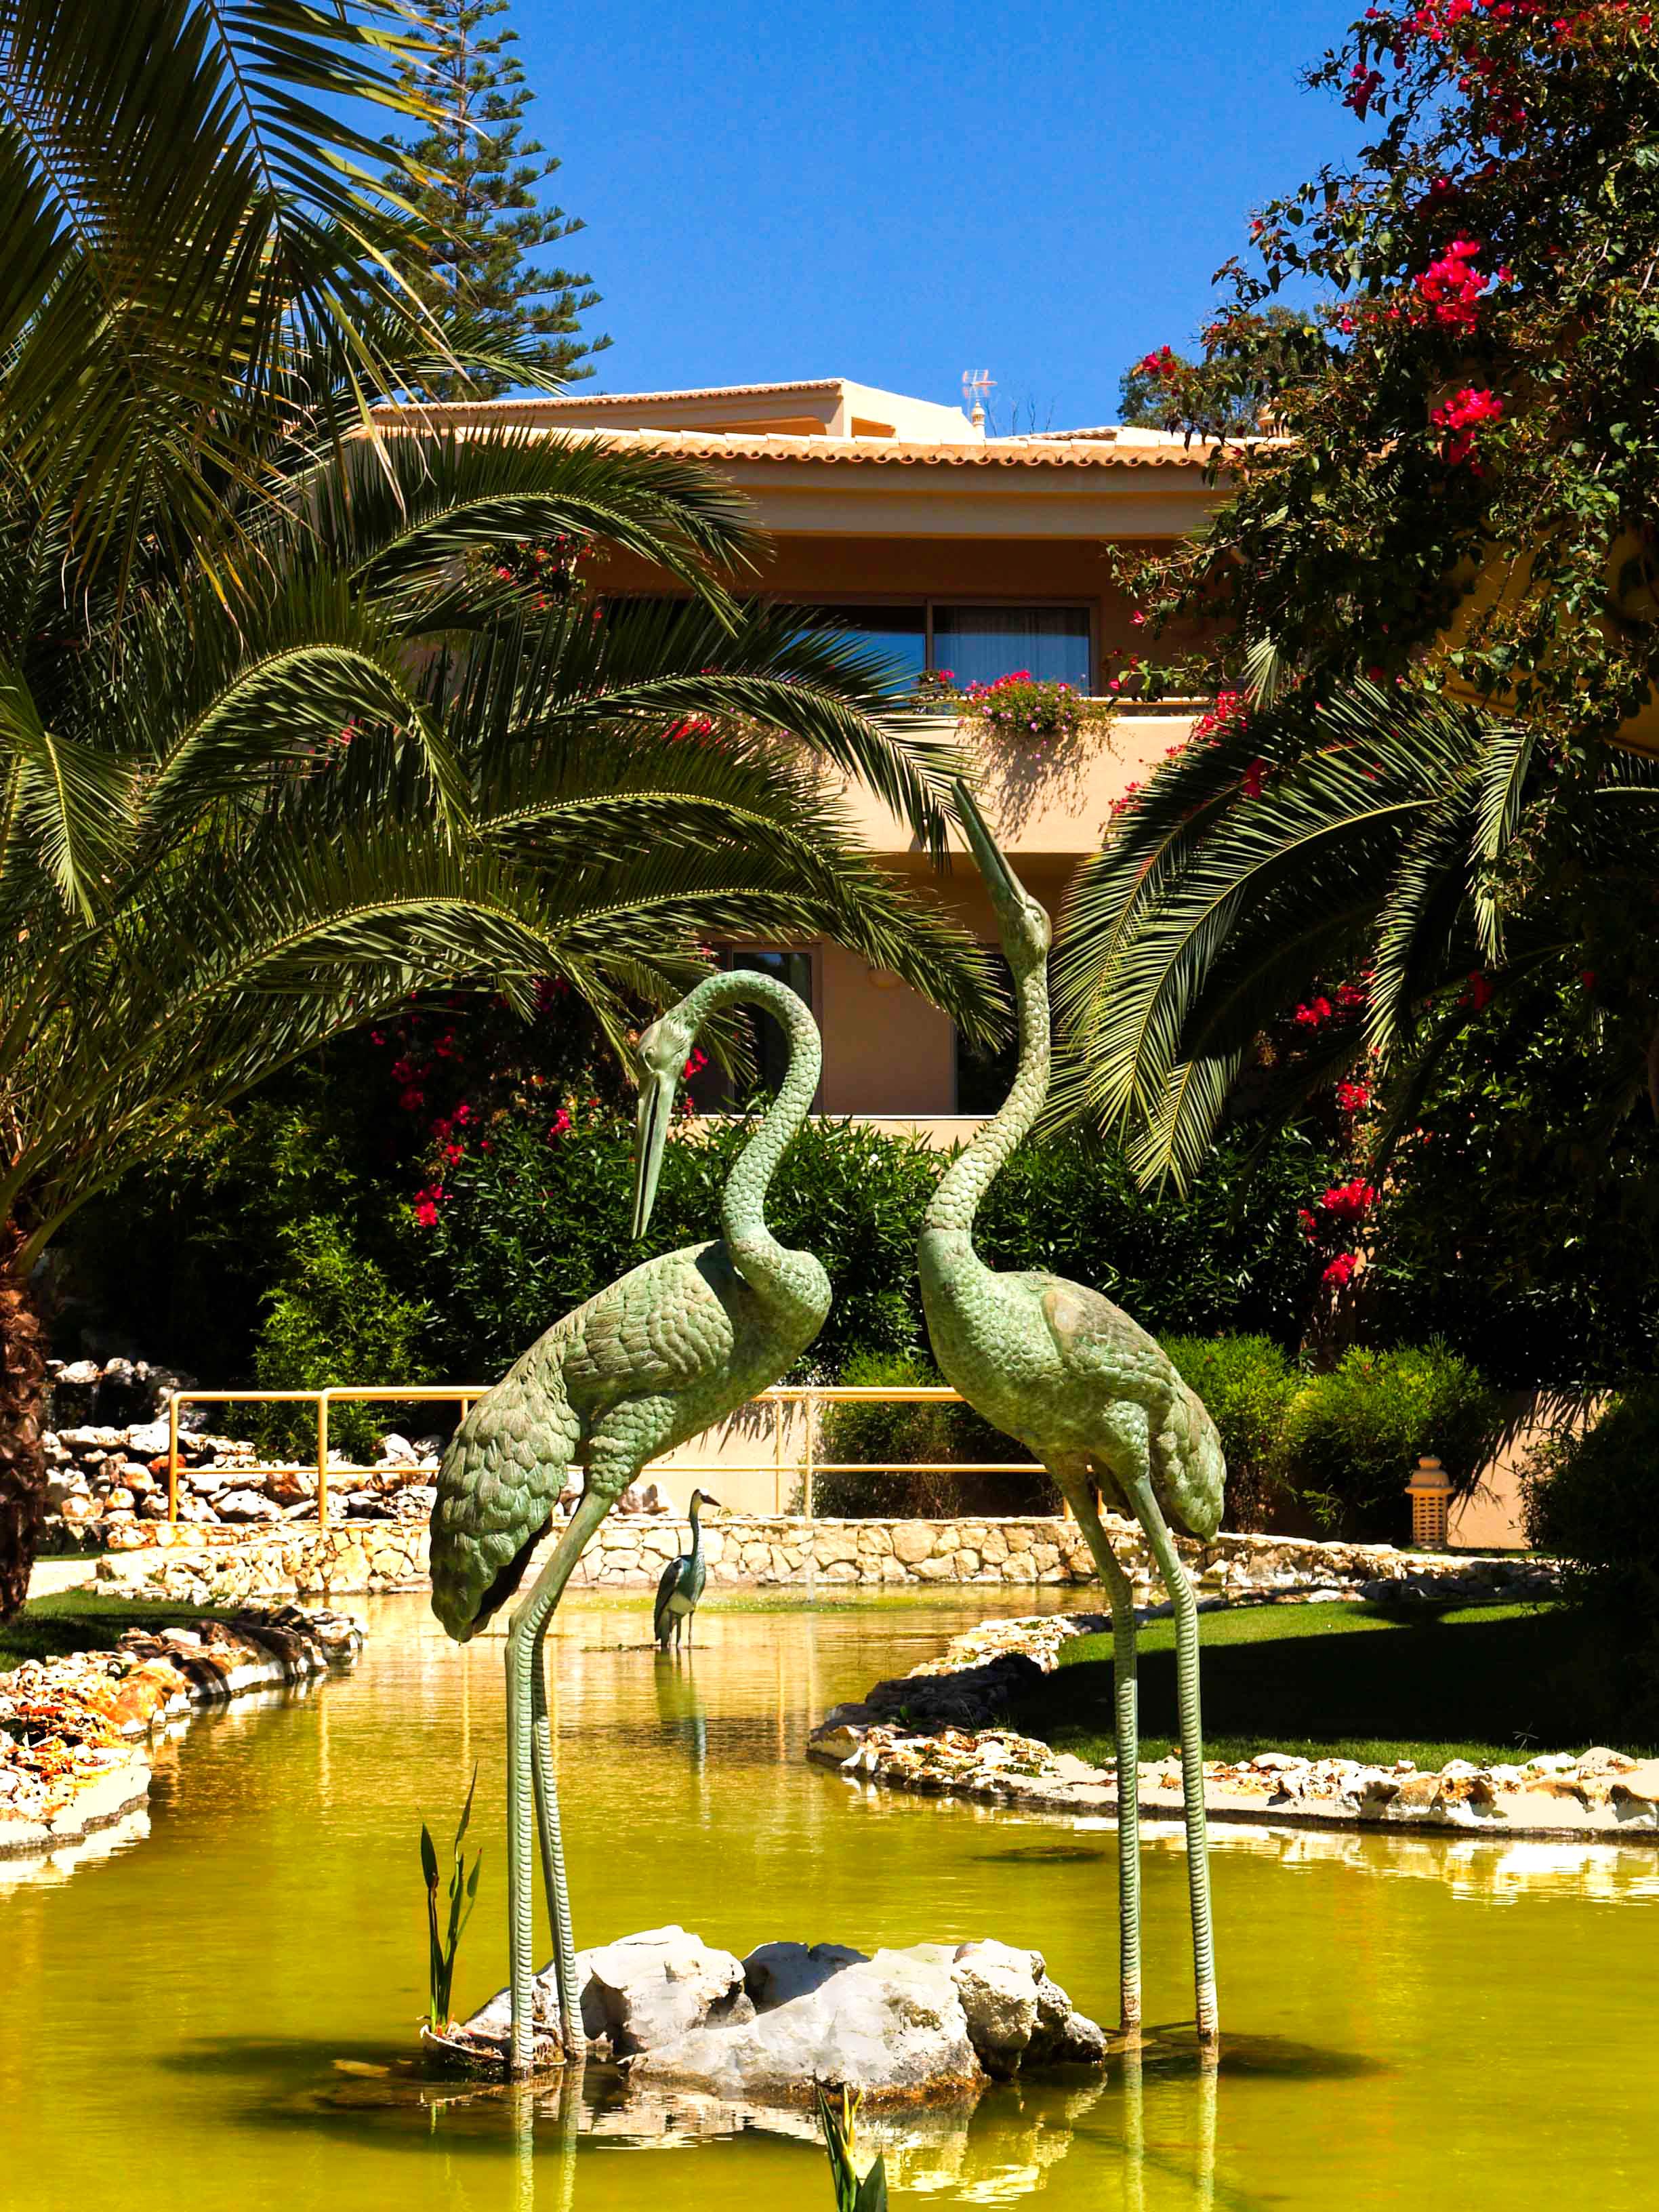 Tropical gardens & waterfalls